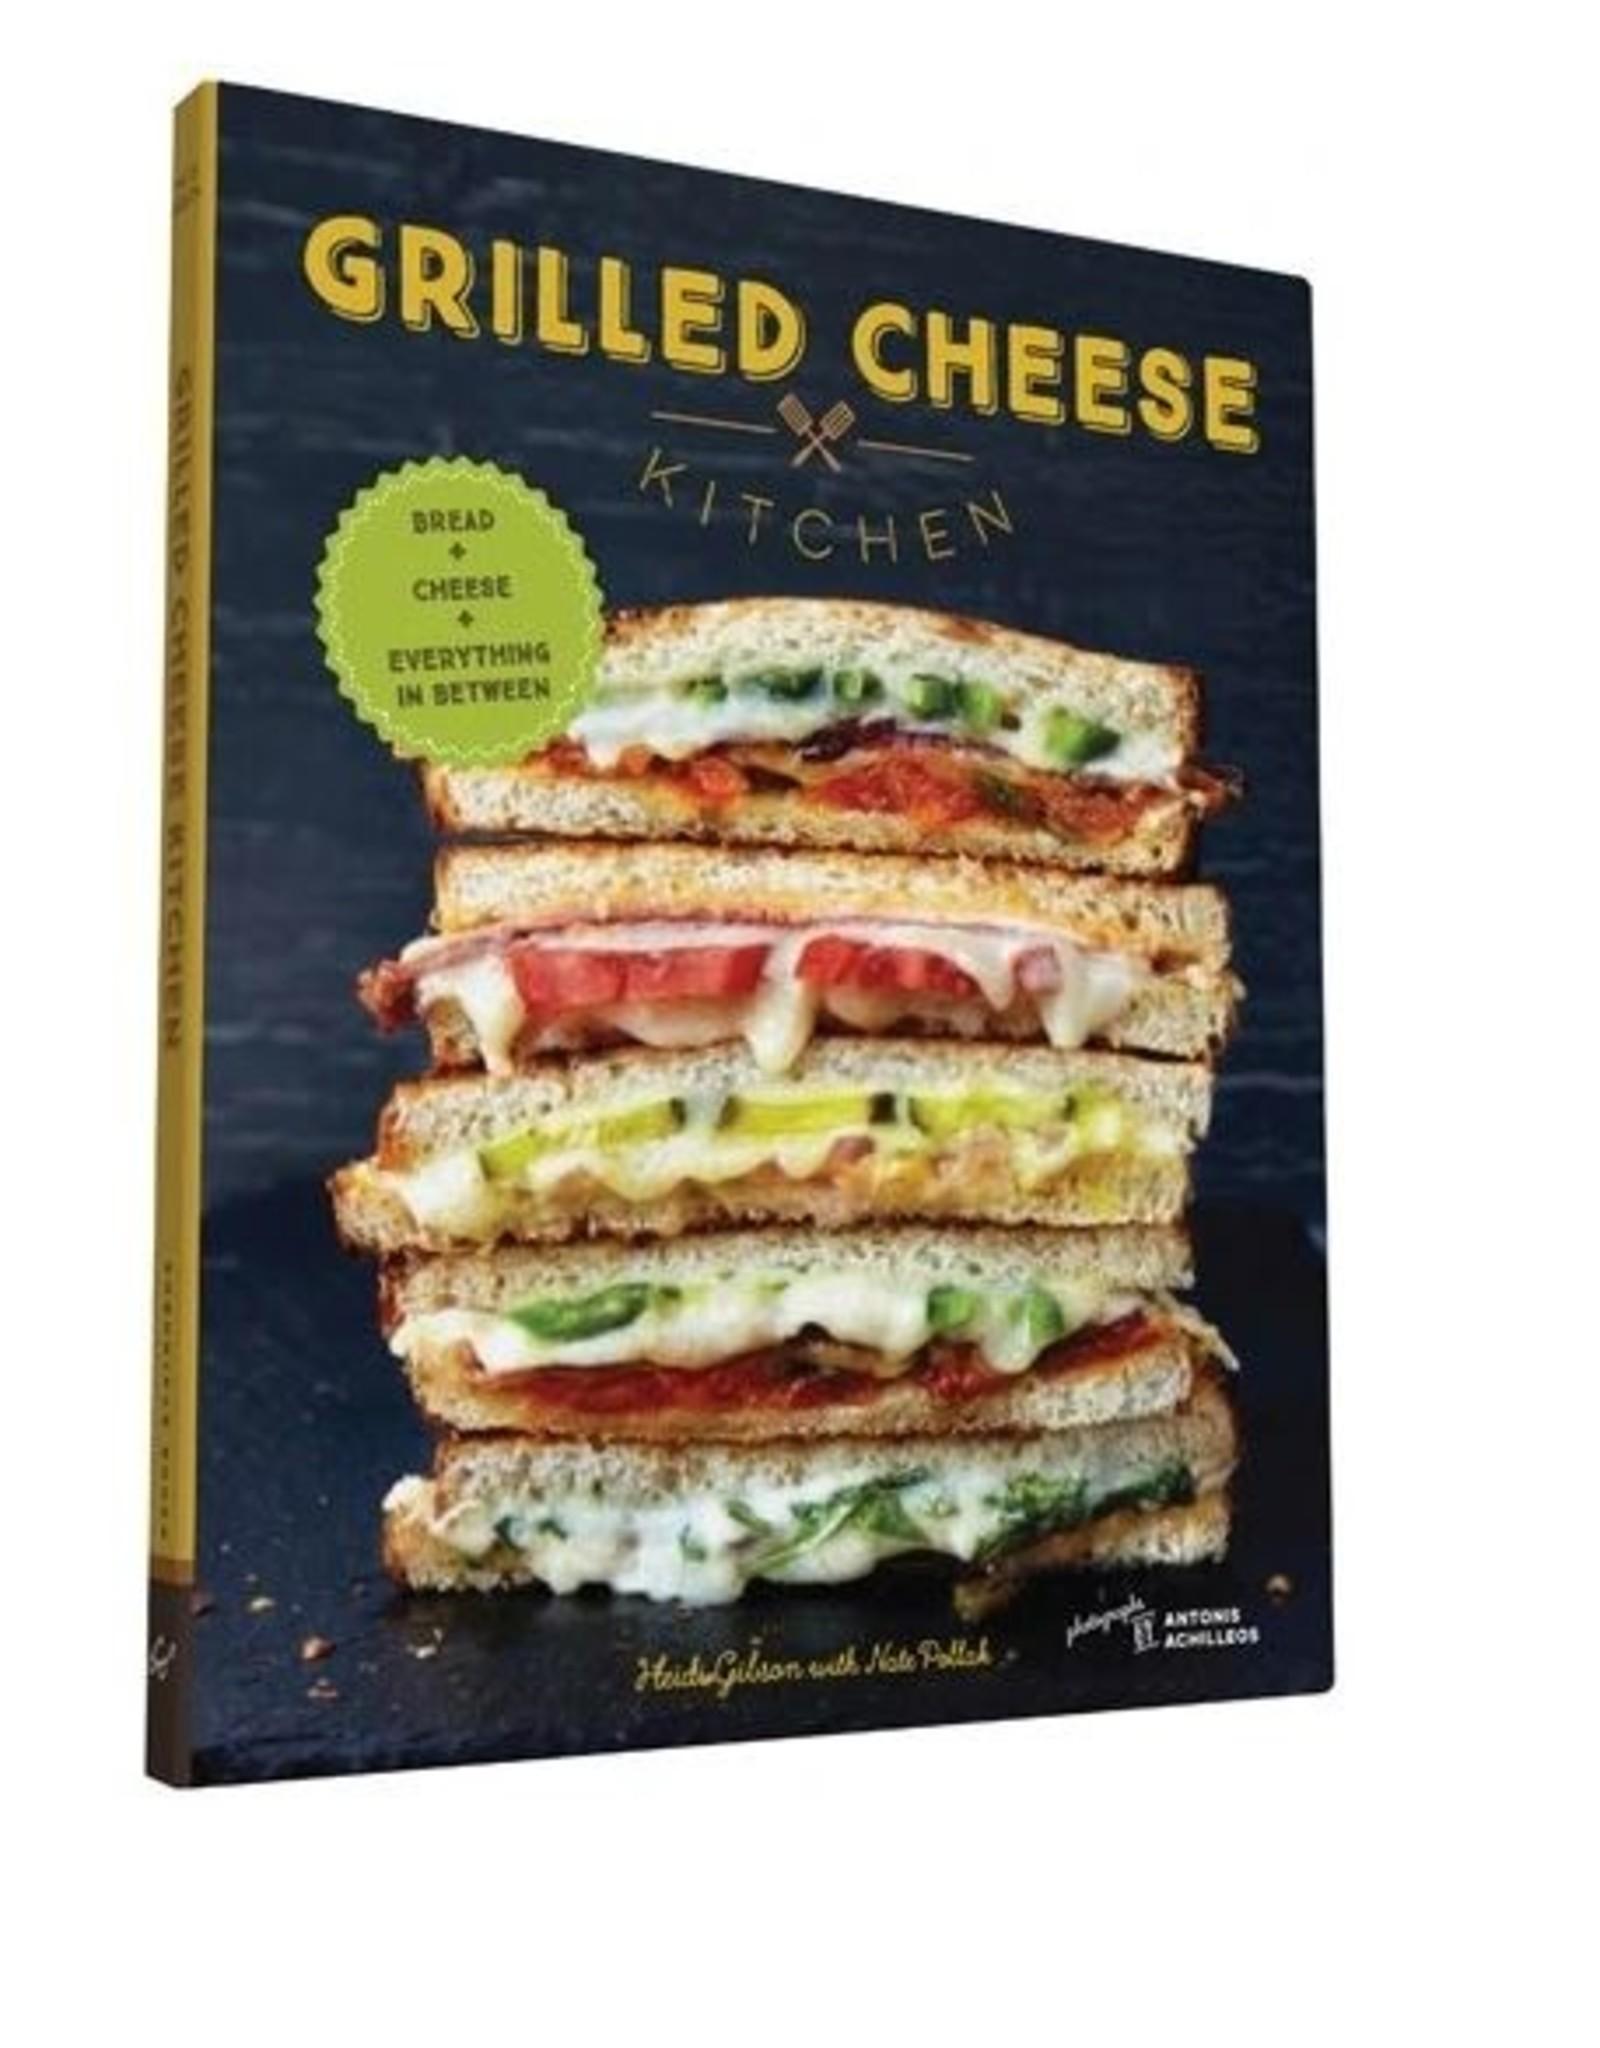 Cookbook: Grilled Cheese Kitchen